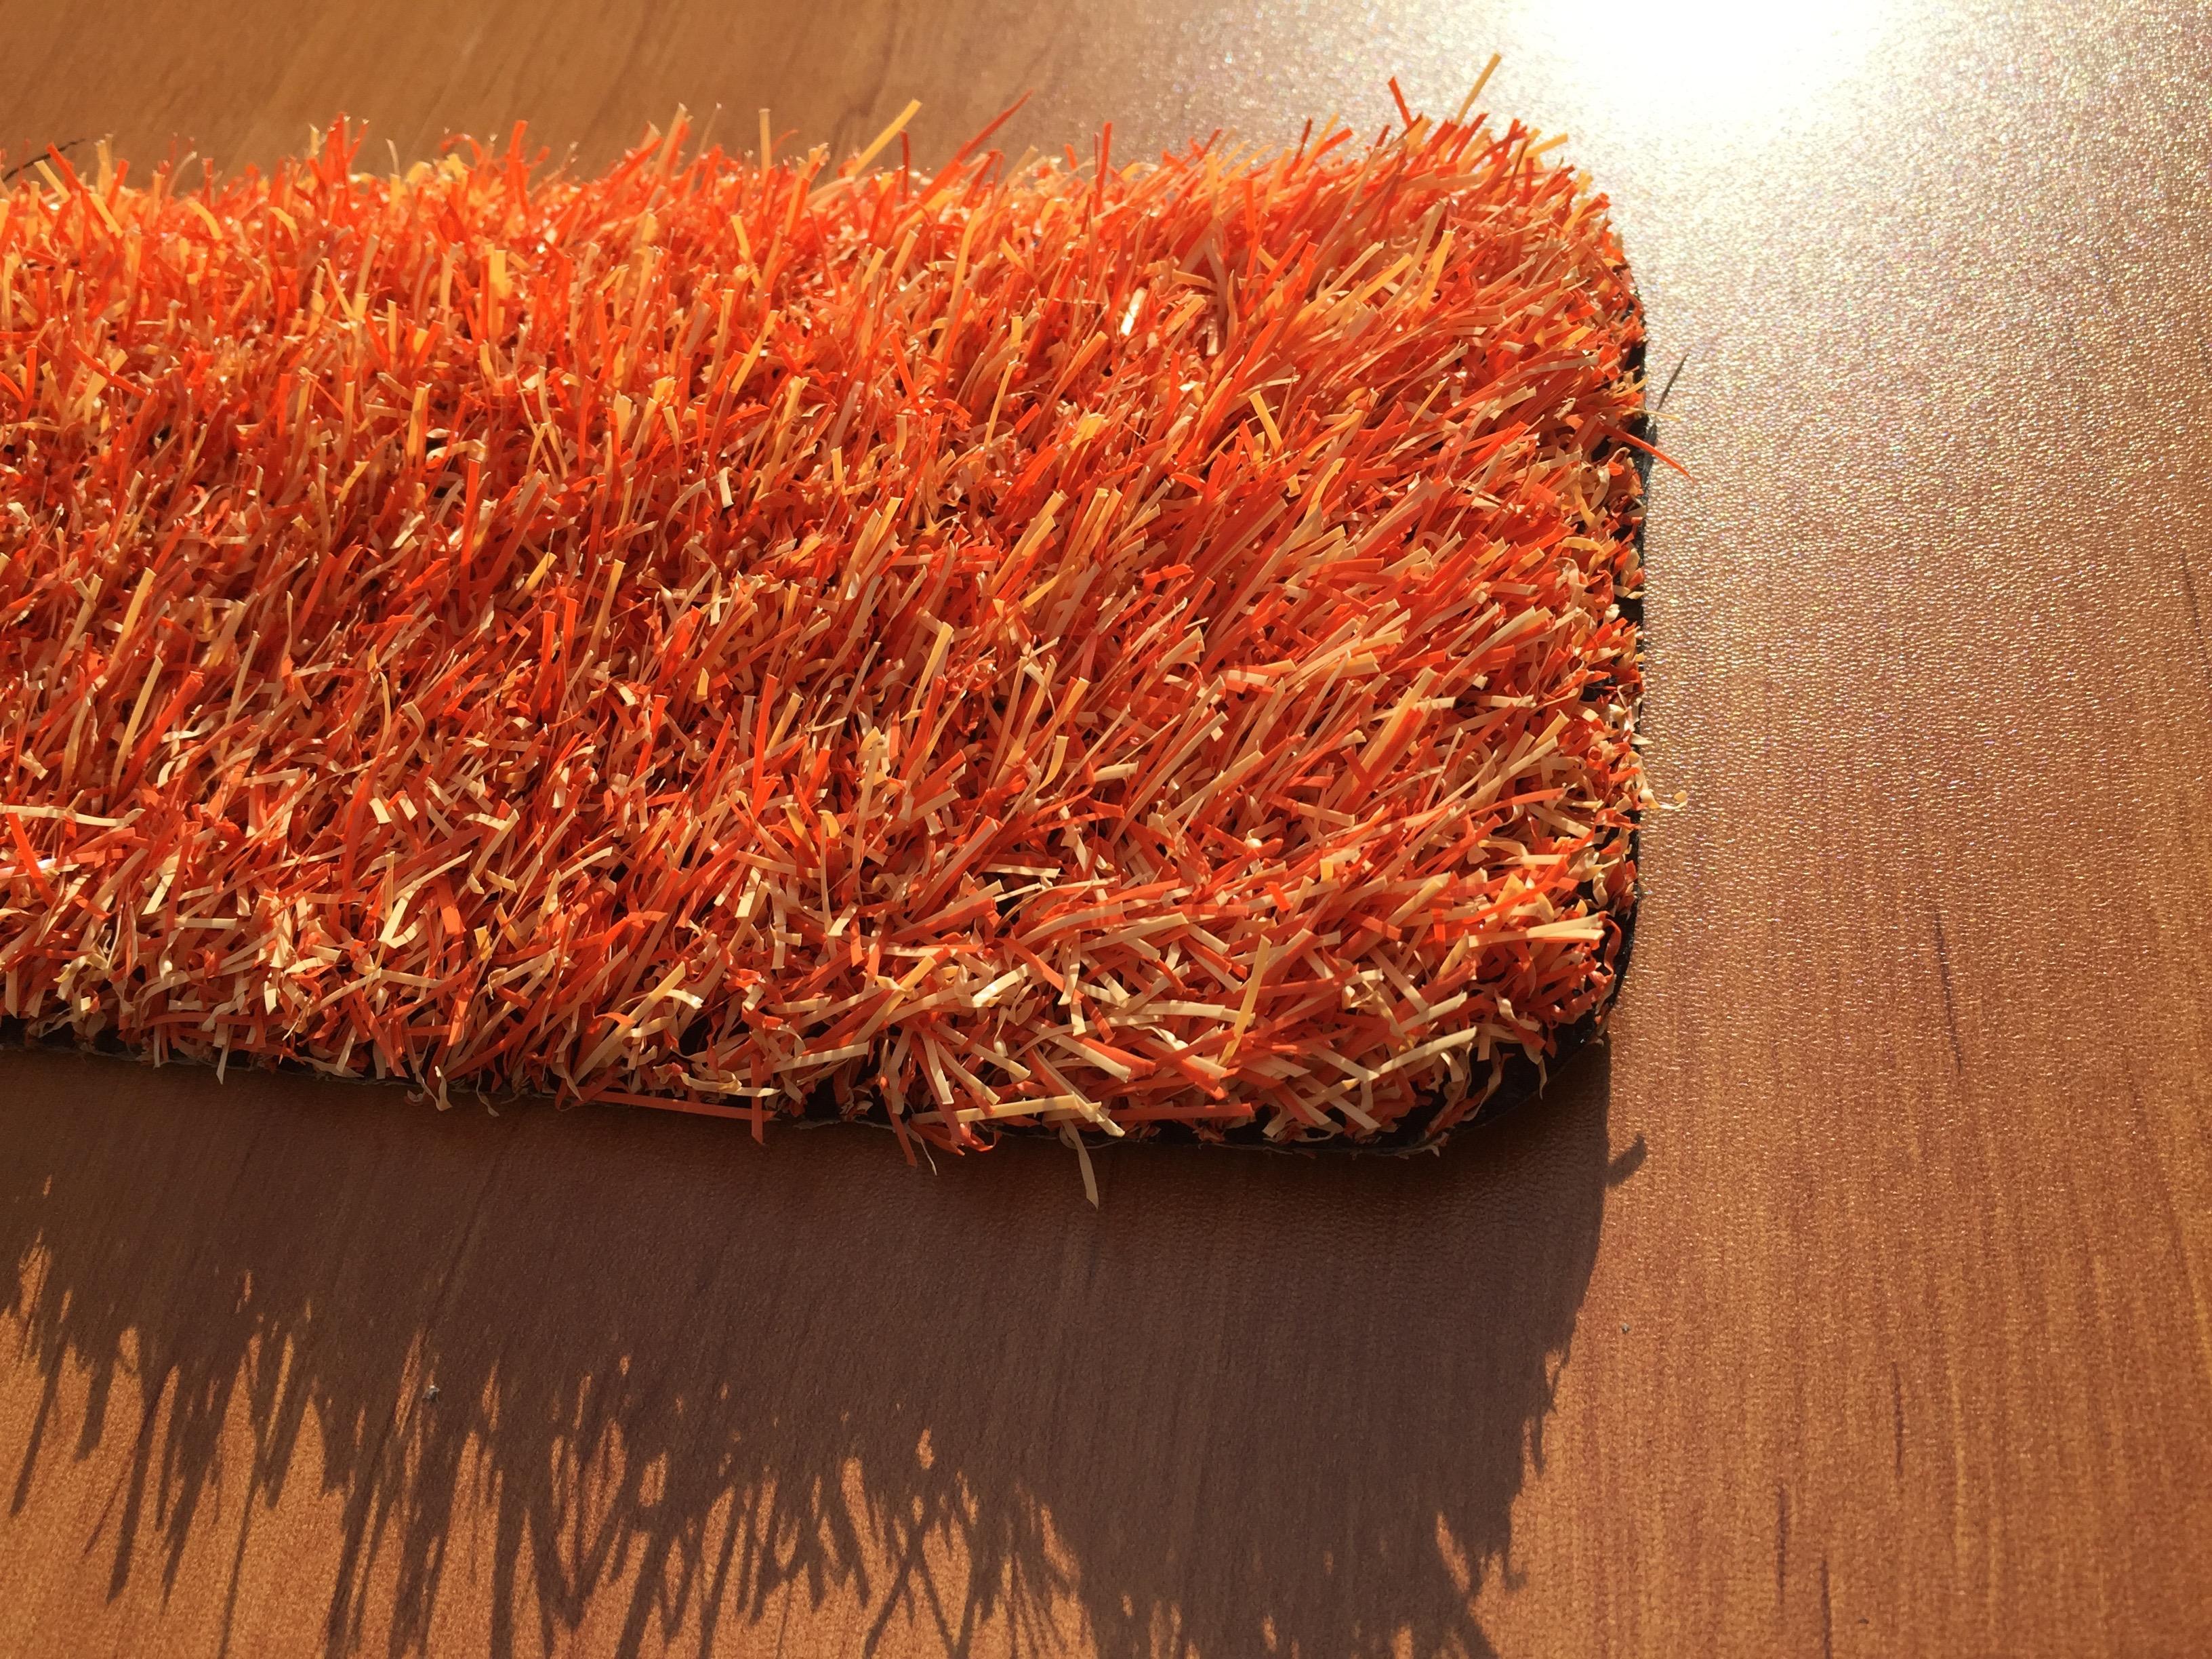 tapis gazon synthetique funky grass tapis moderne par unamourdetapis ebay. Black Bedroom Furniture Sets. Home Design Ideas